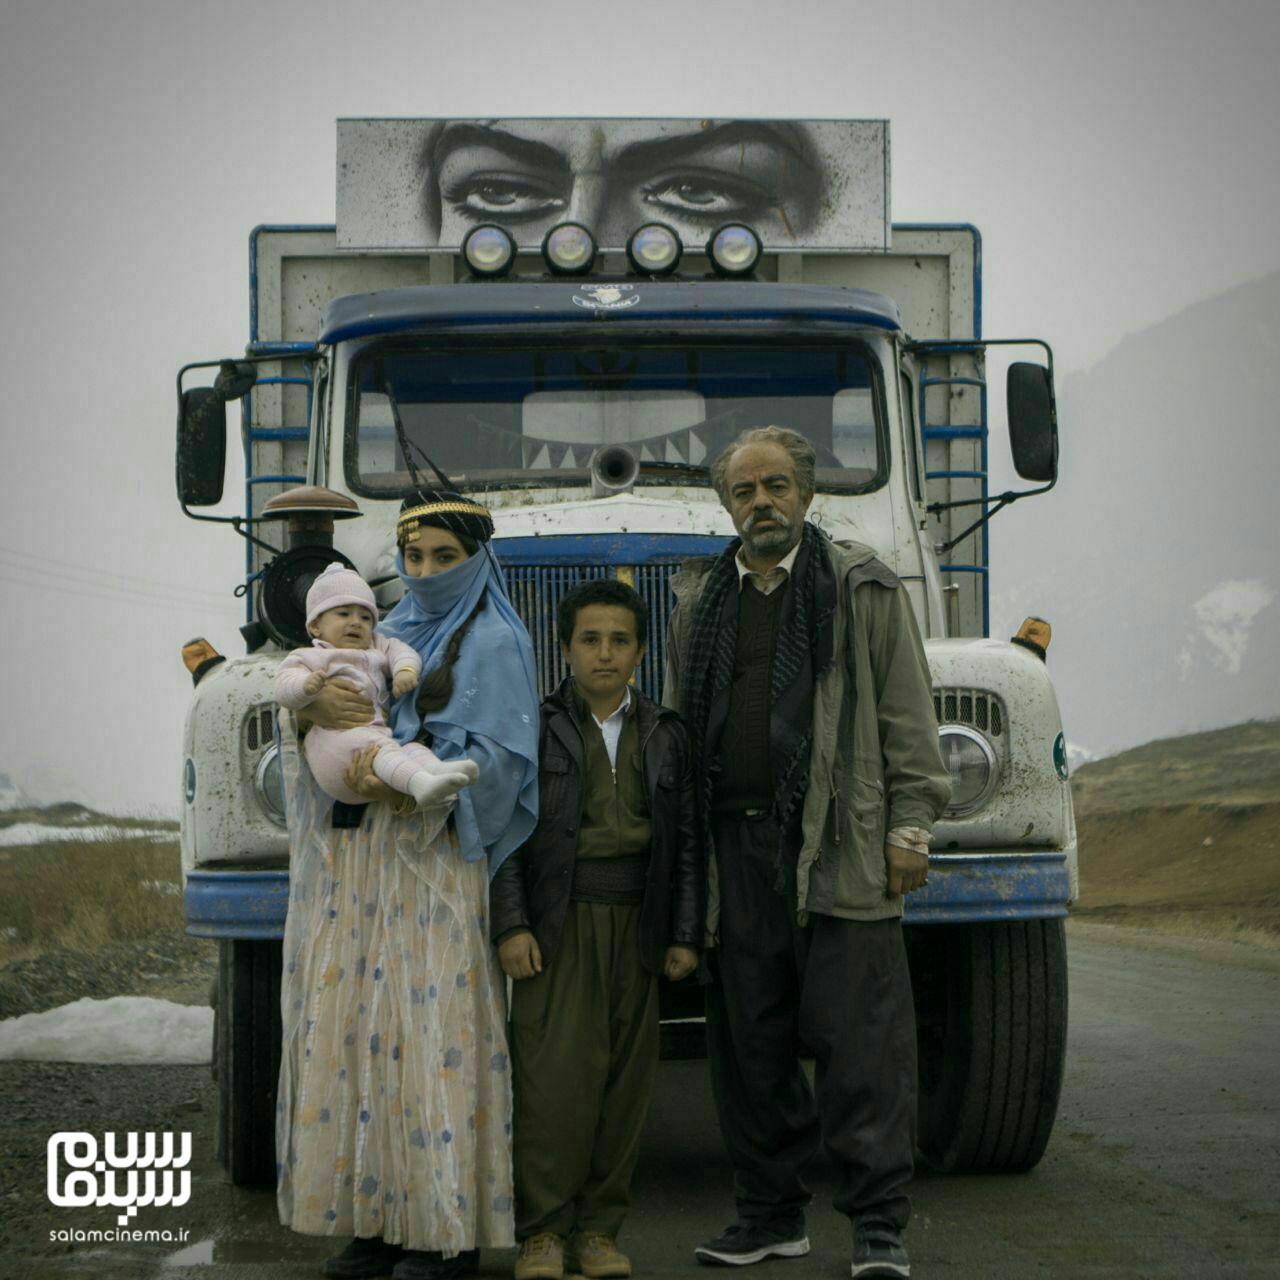 فیلم کامیون